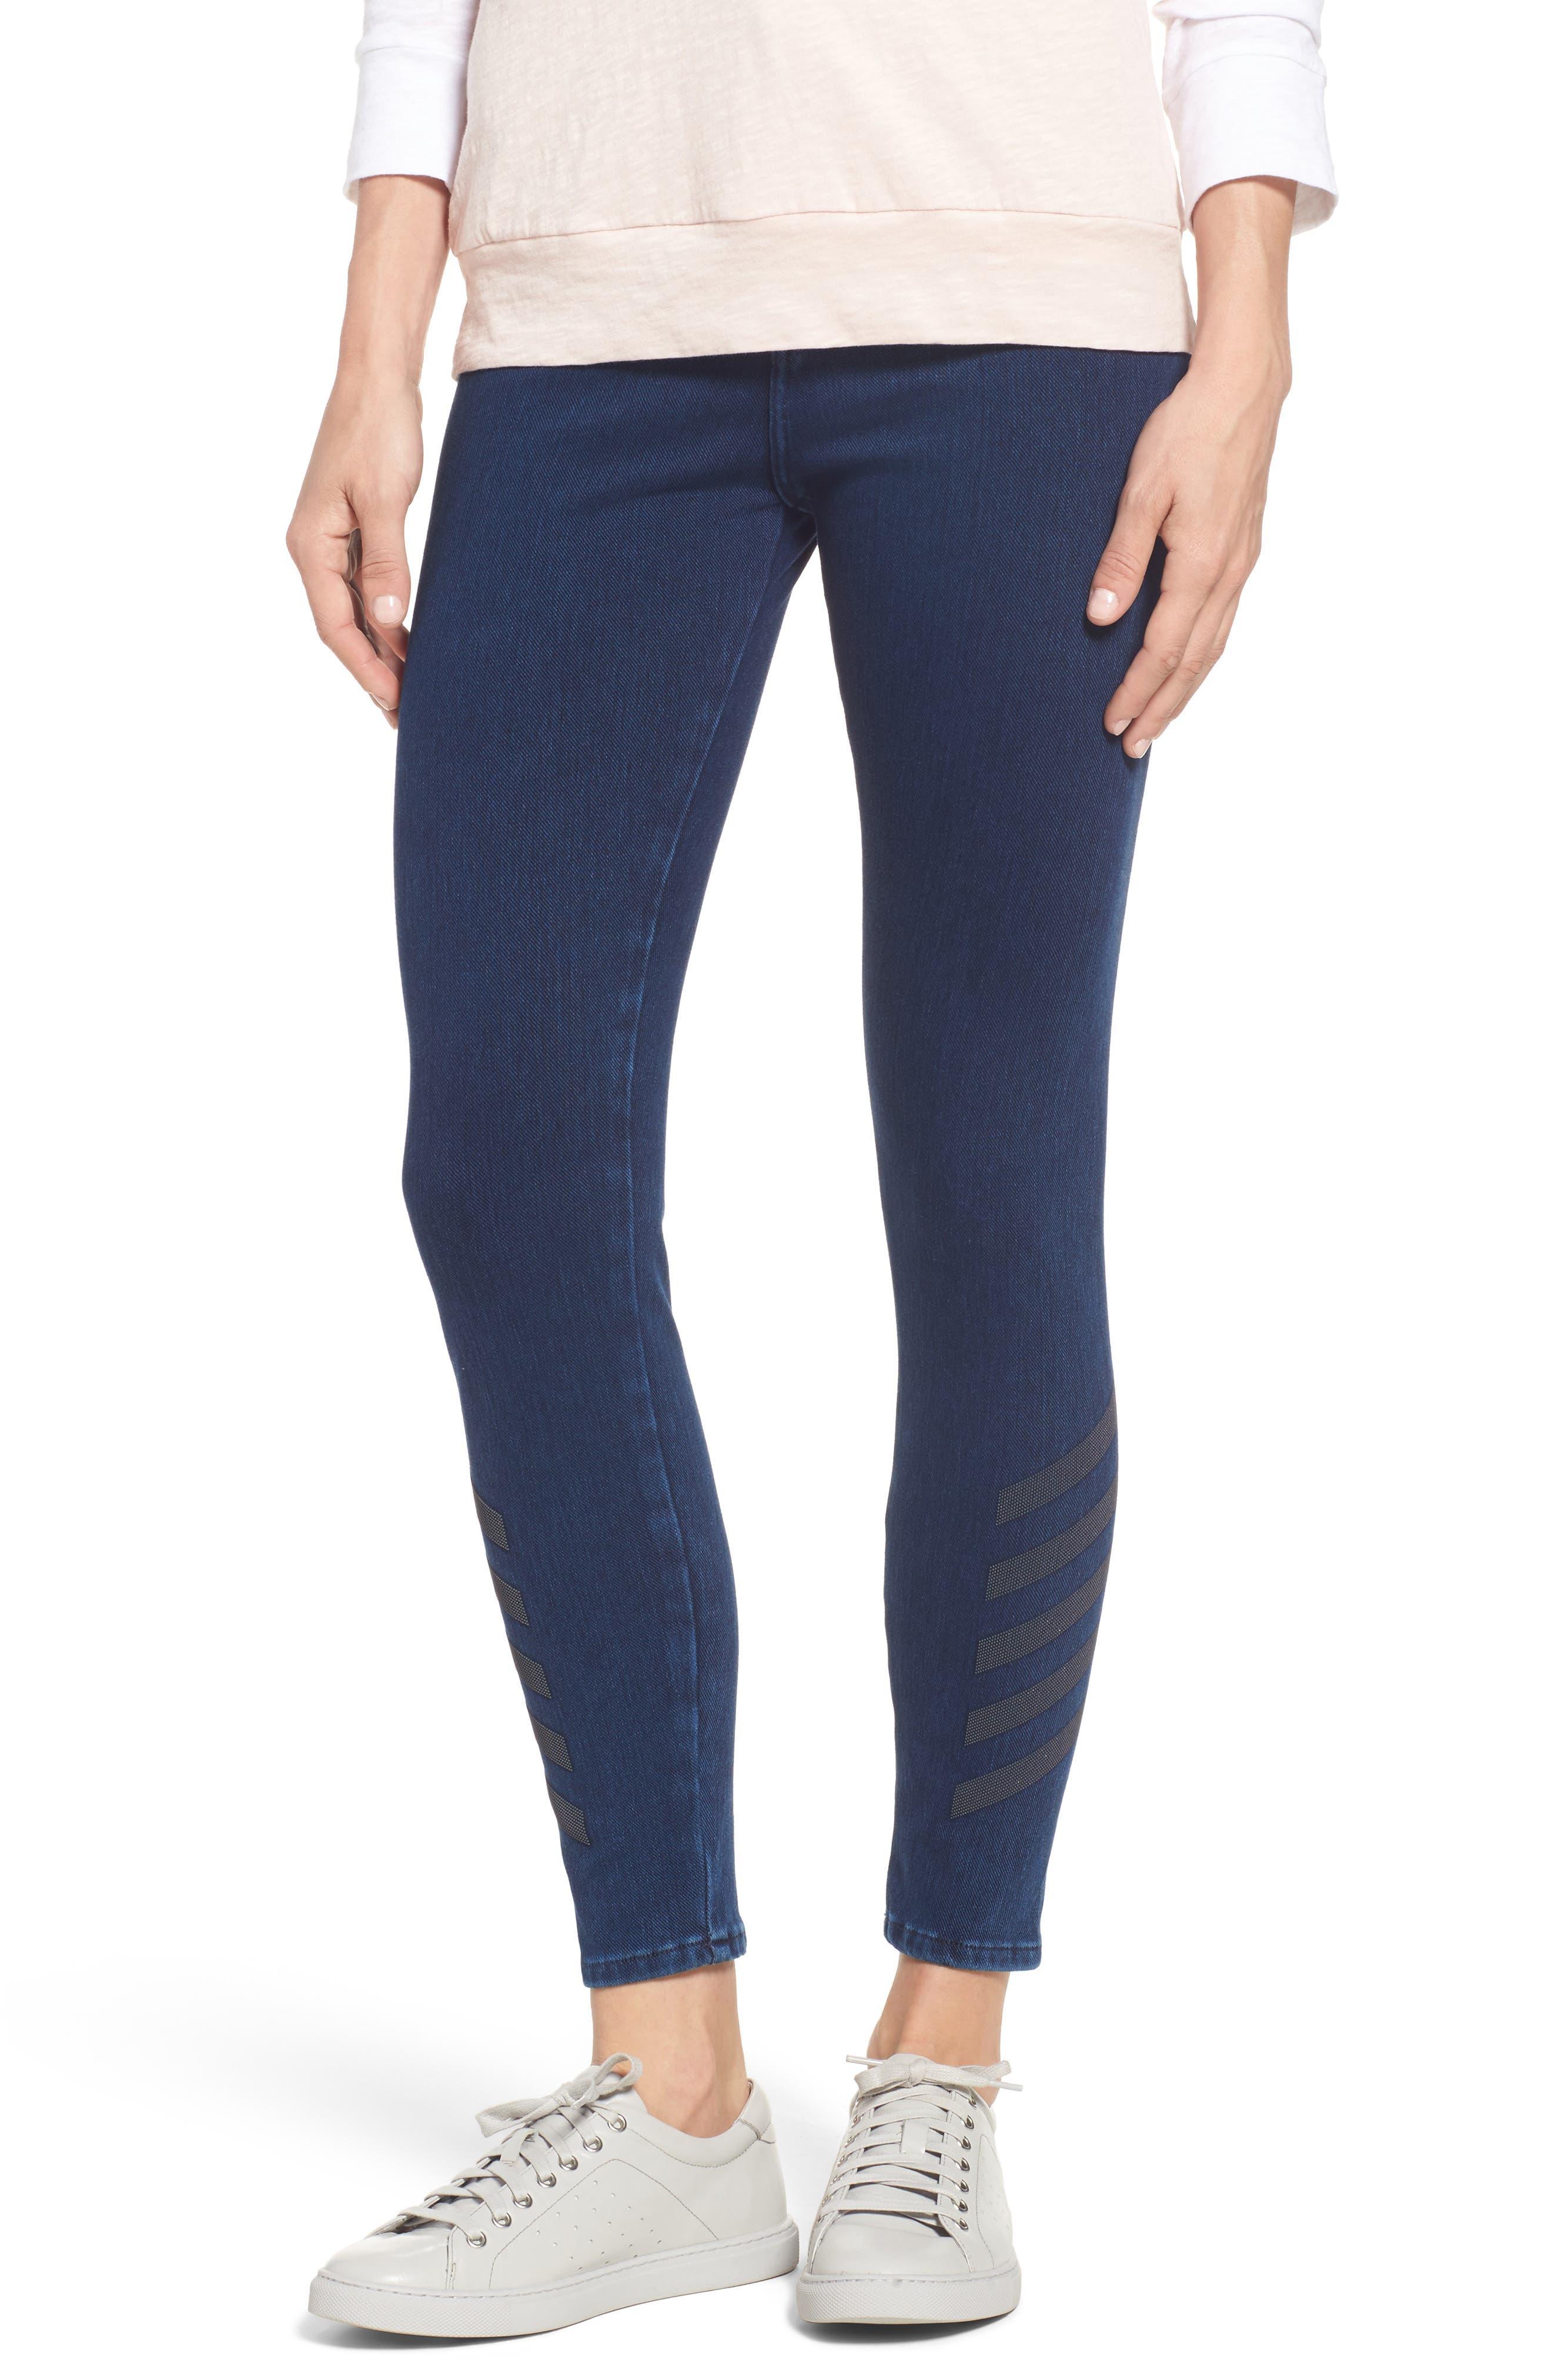 Main Image - Mavi Jeans Joie Embellished High Waist Skinny Jeans (Dark Indigo Move)